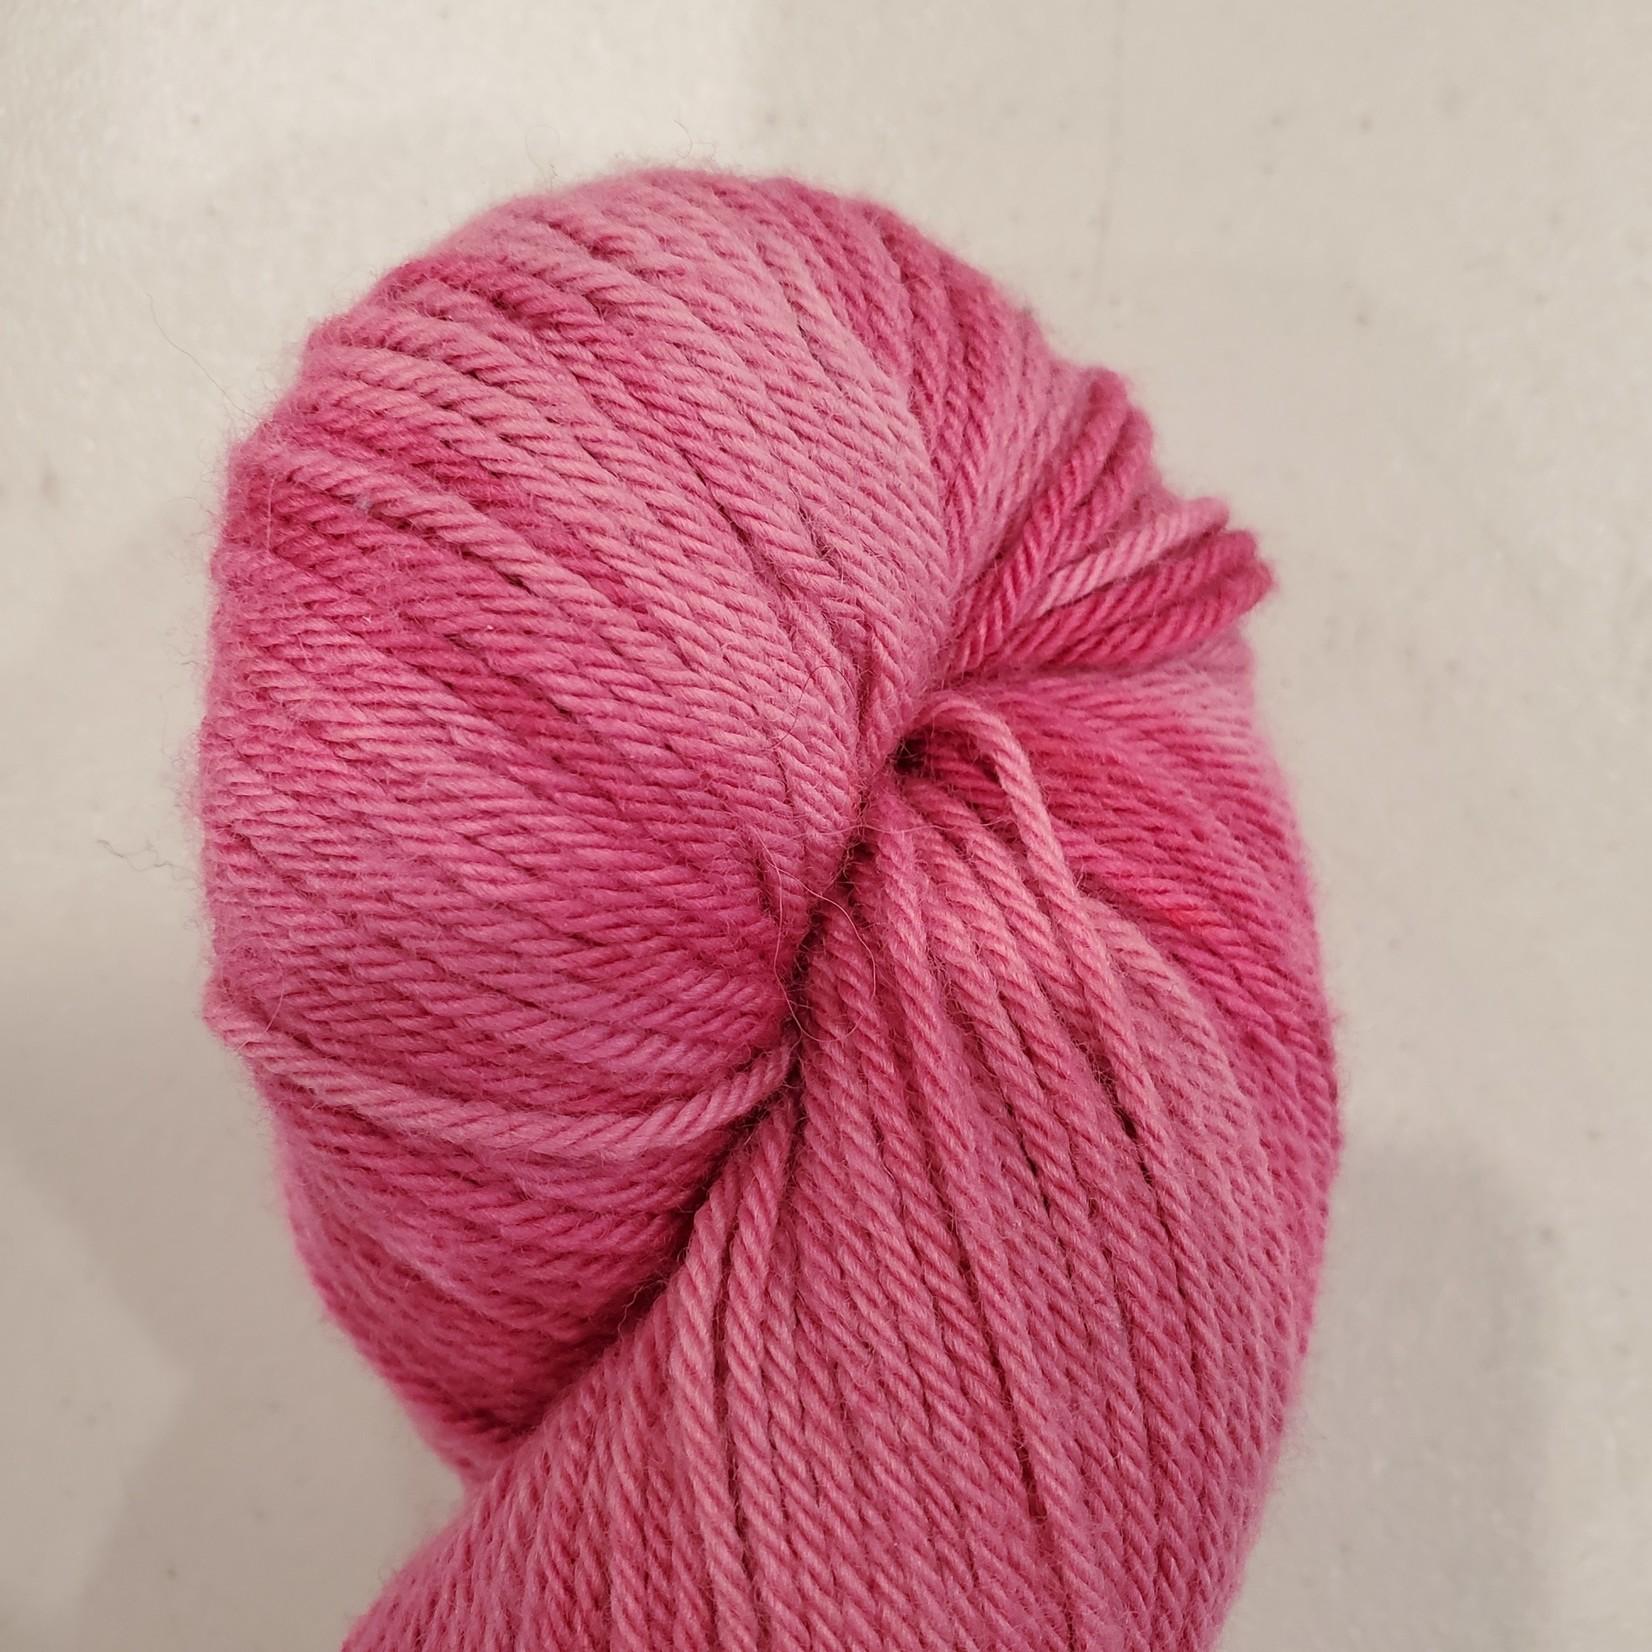 Knit Girl Yarns DK